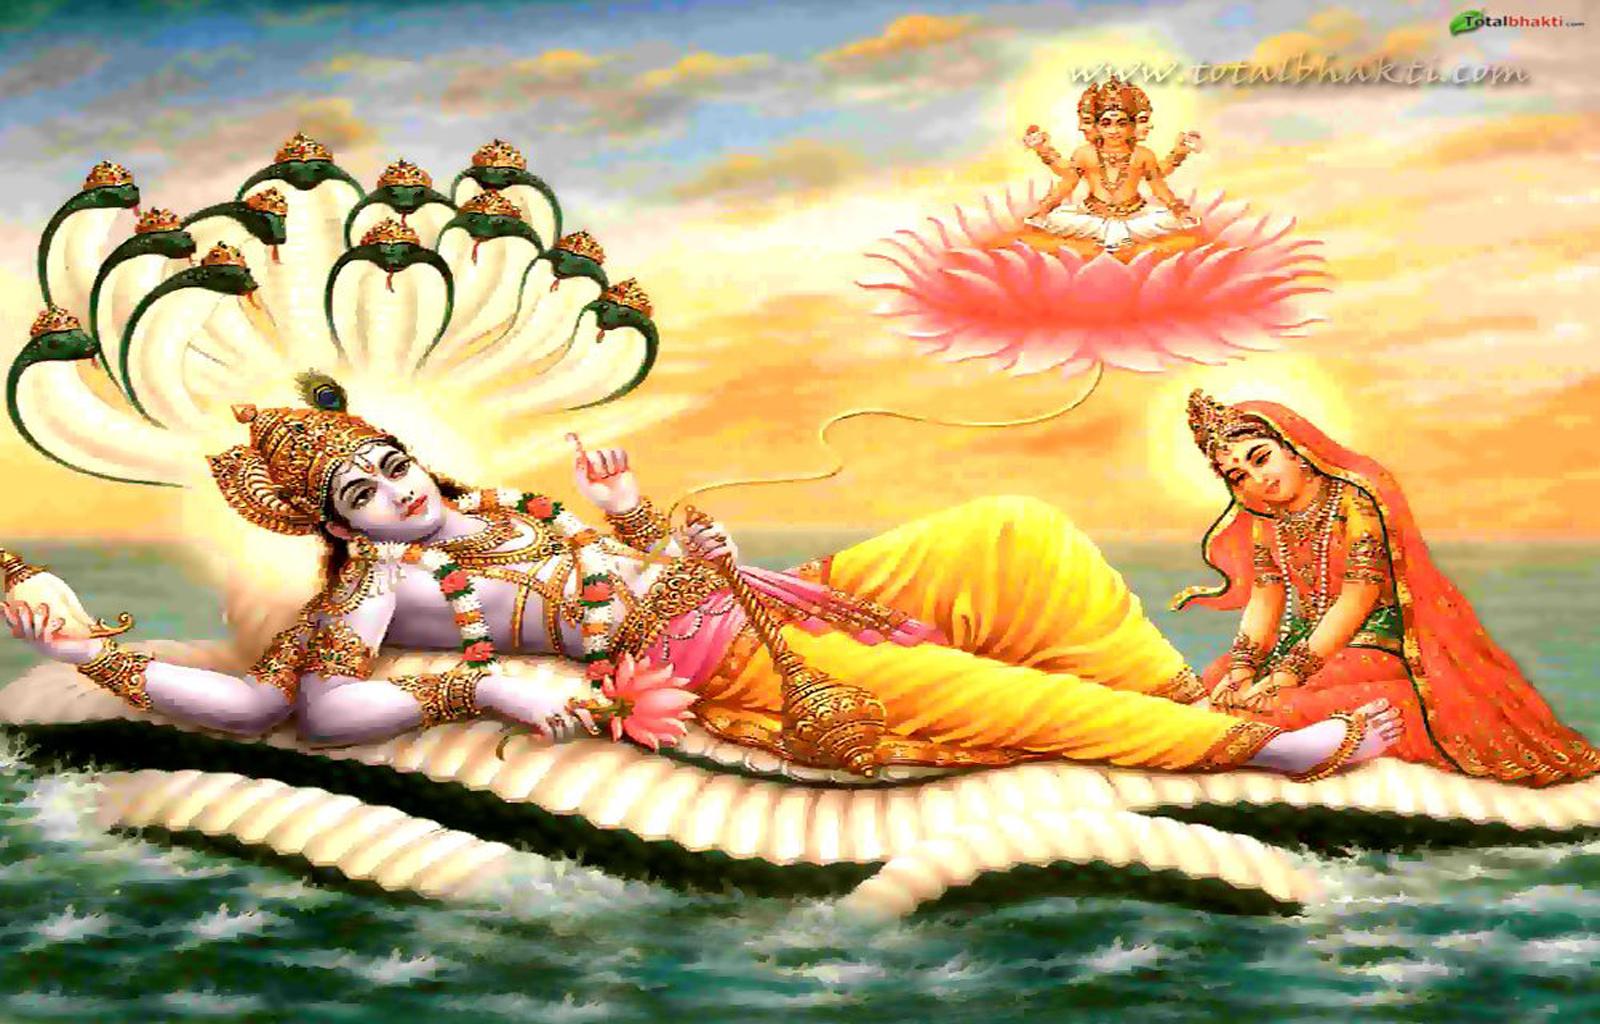 http://4.bp.blogspot.com/-OfYVIZk1LWw/Teew5Hlu99I/AAAAAAAAEFE/mkAp7C9NTms/s1600/Lord-Vishnu-416.jpg